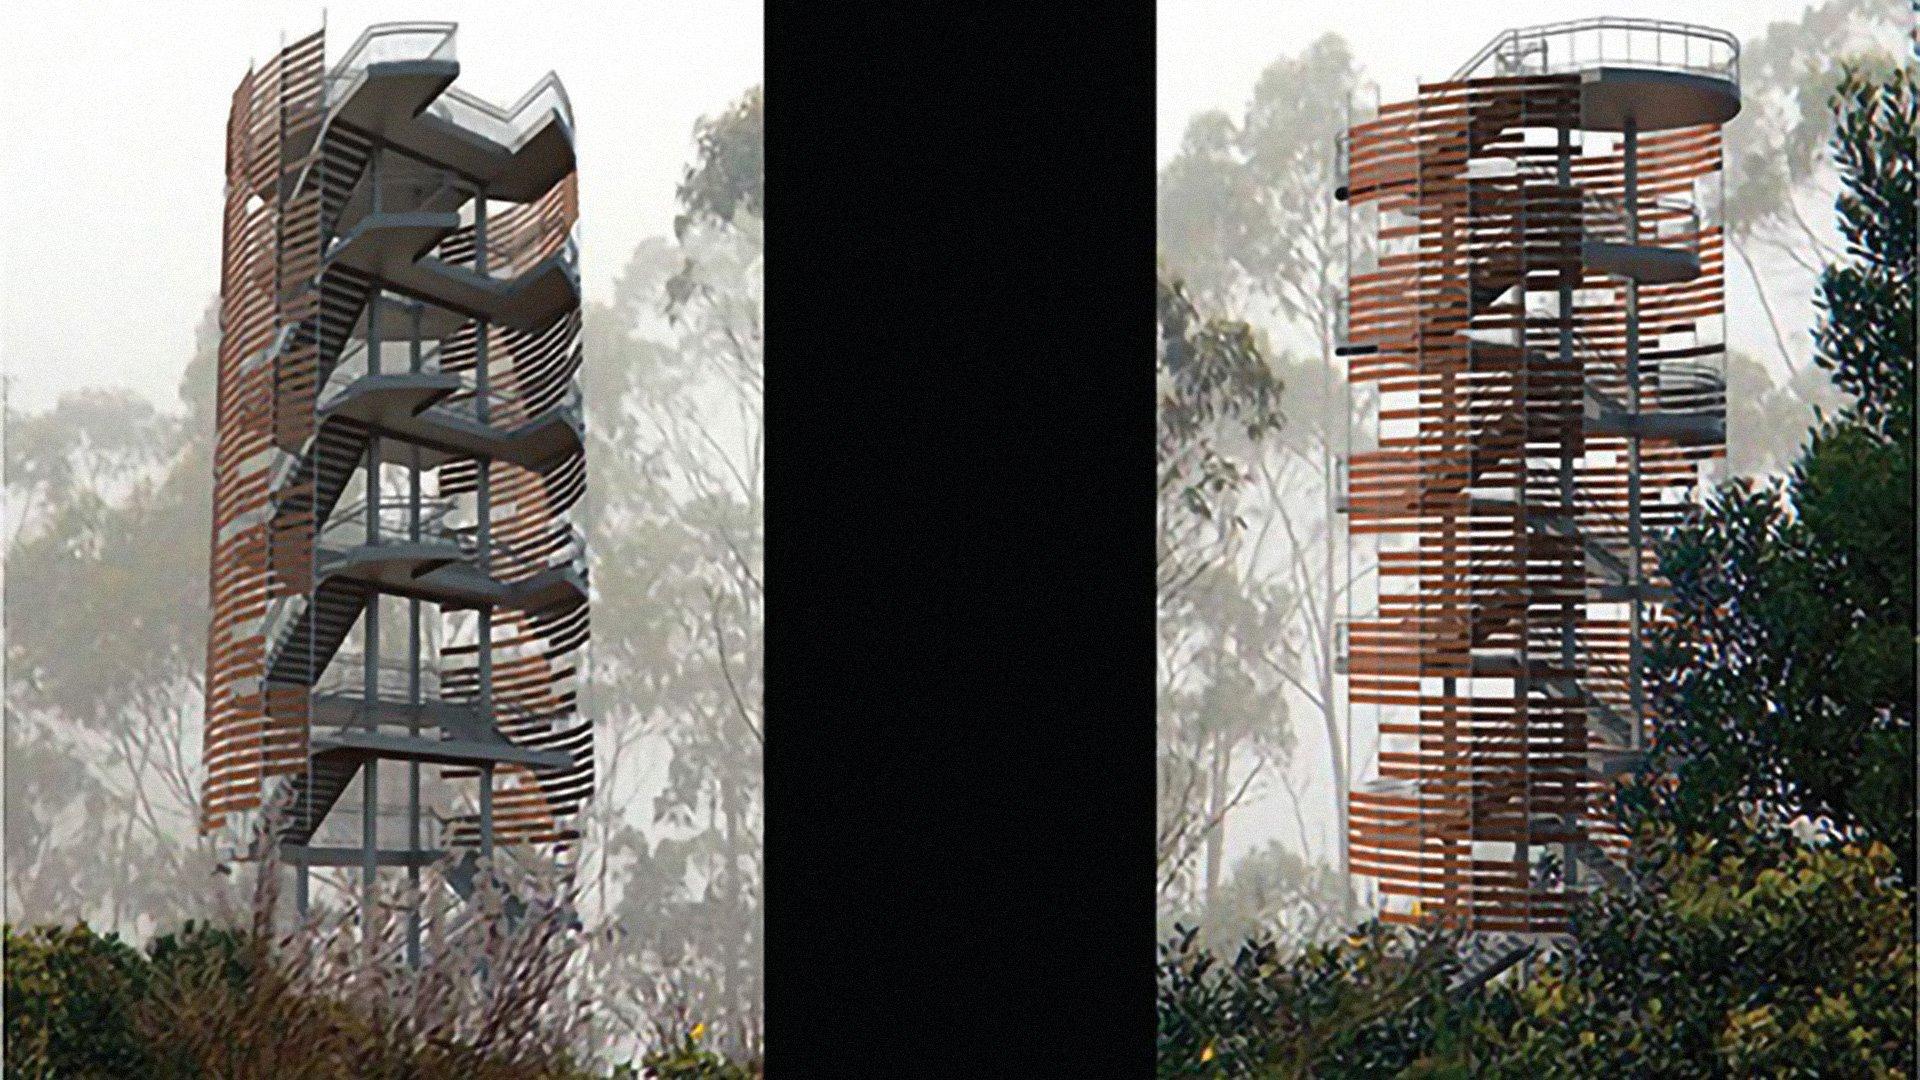 Sassafrass Mountain Rendering, AIA SC Design Award Recipient